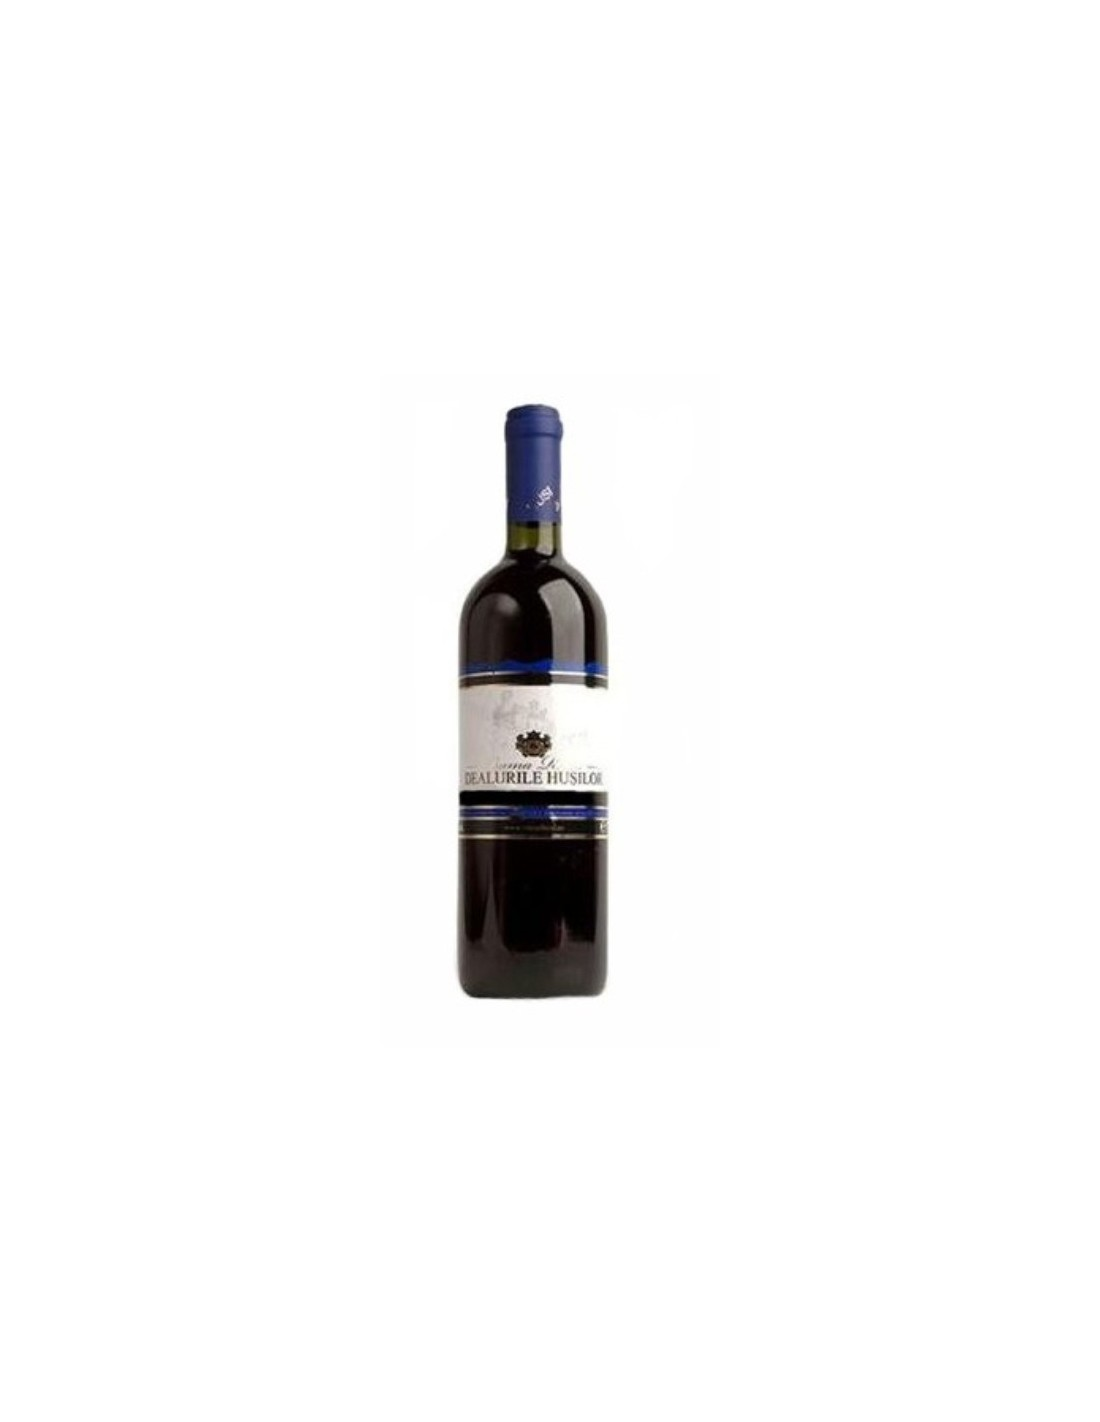 Vin rosu demisec, Dealurile Husilor, 0.75L, 10.5% alc., Romania